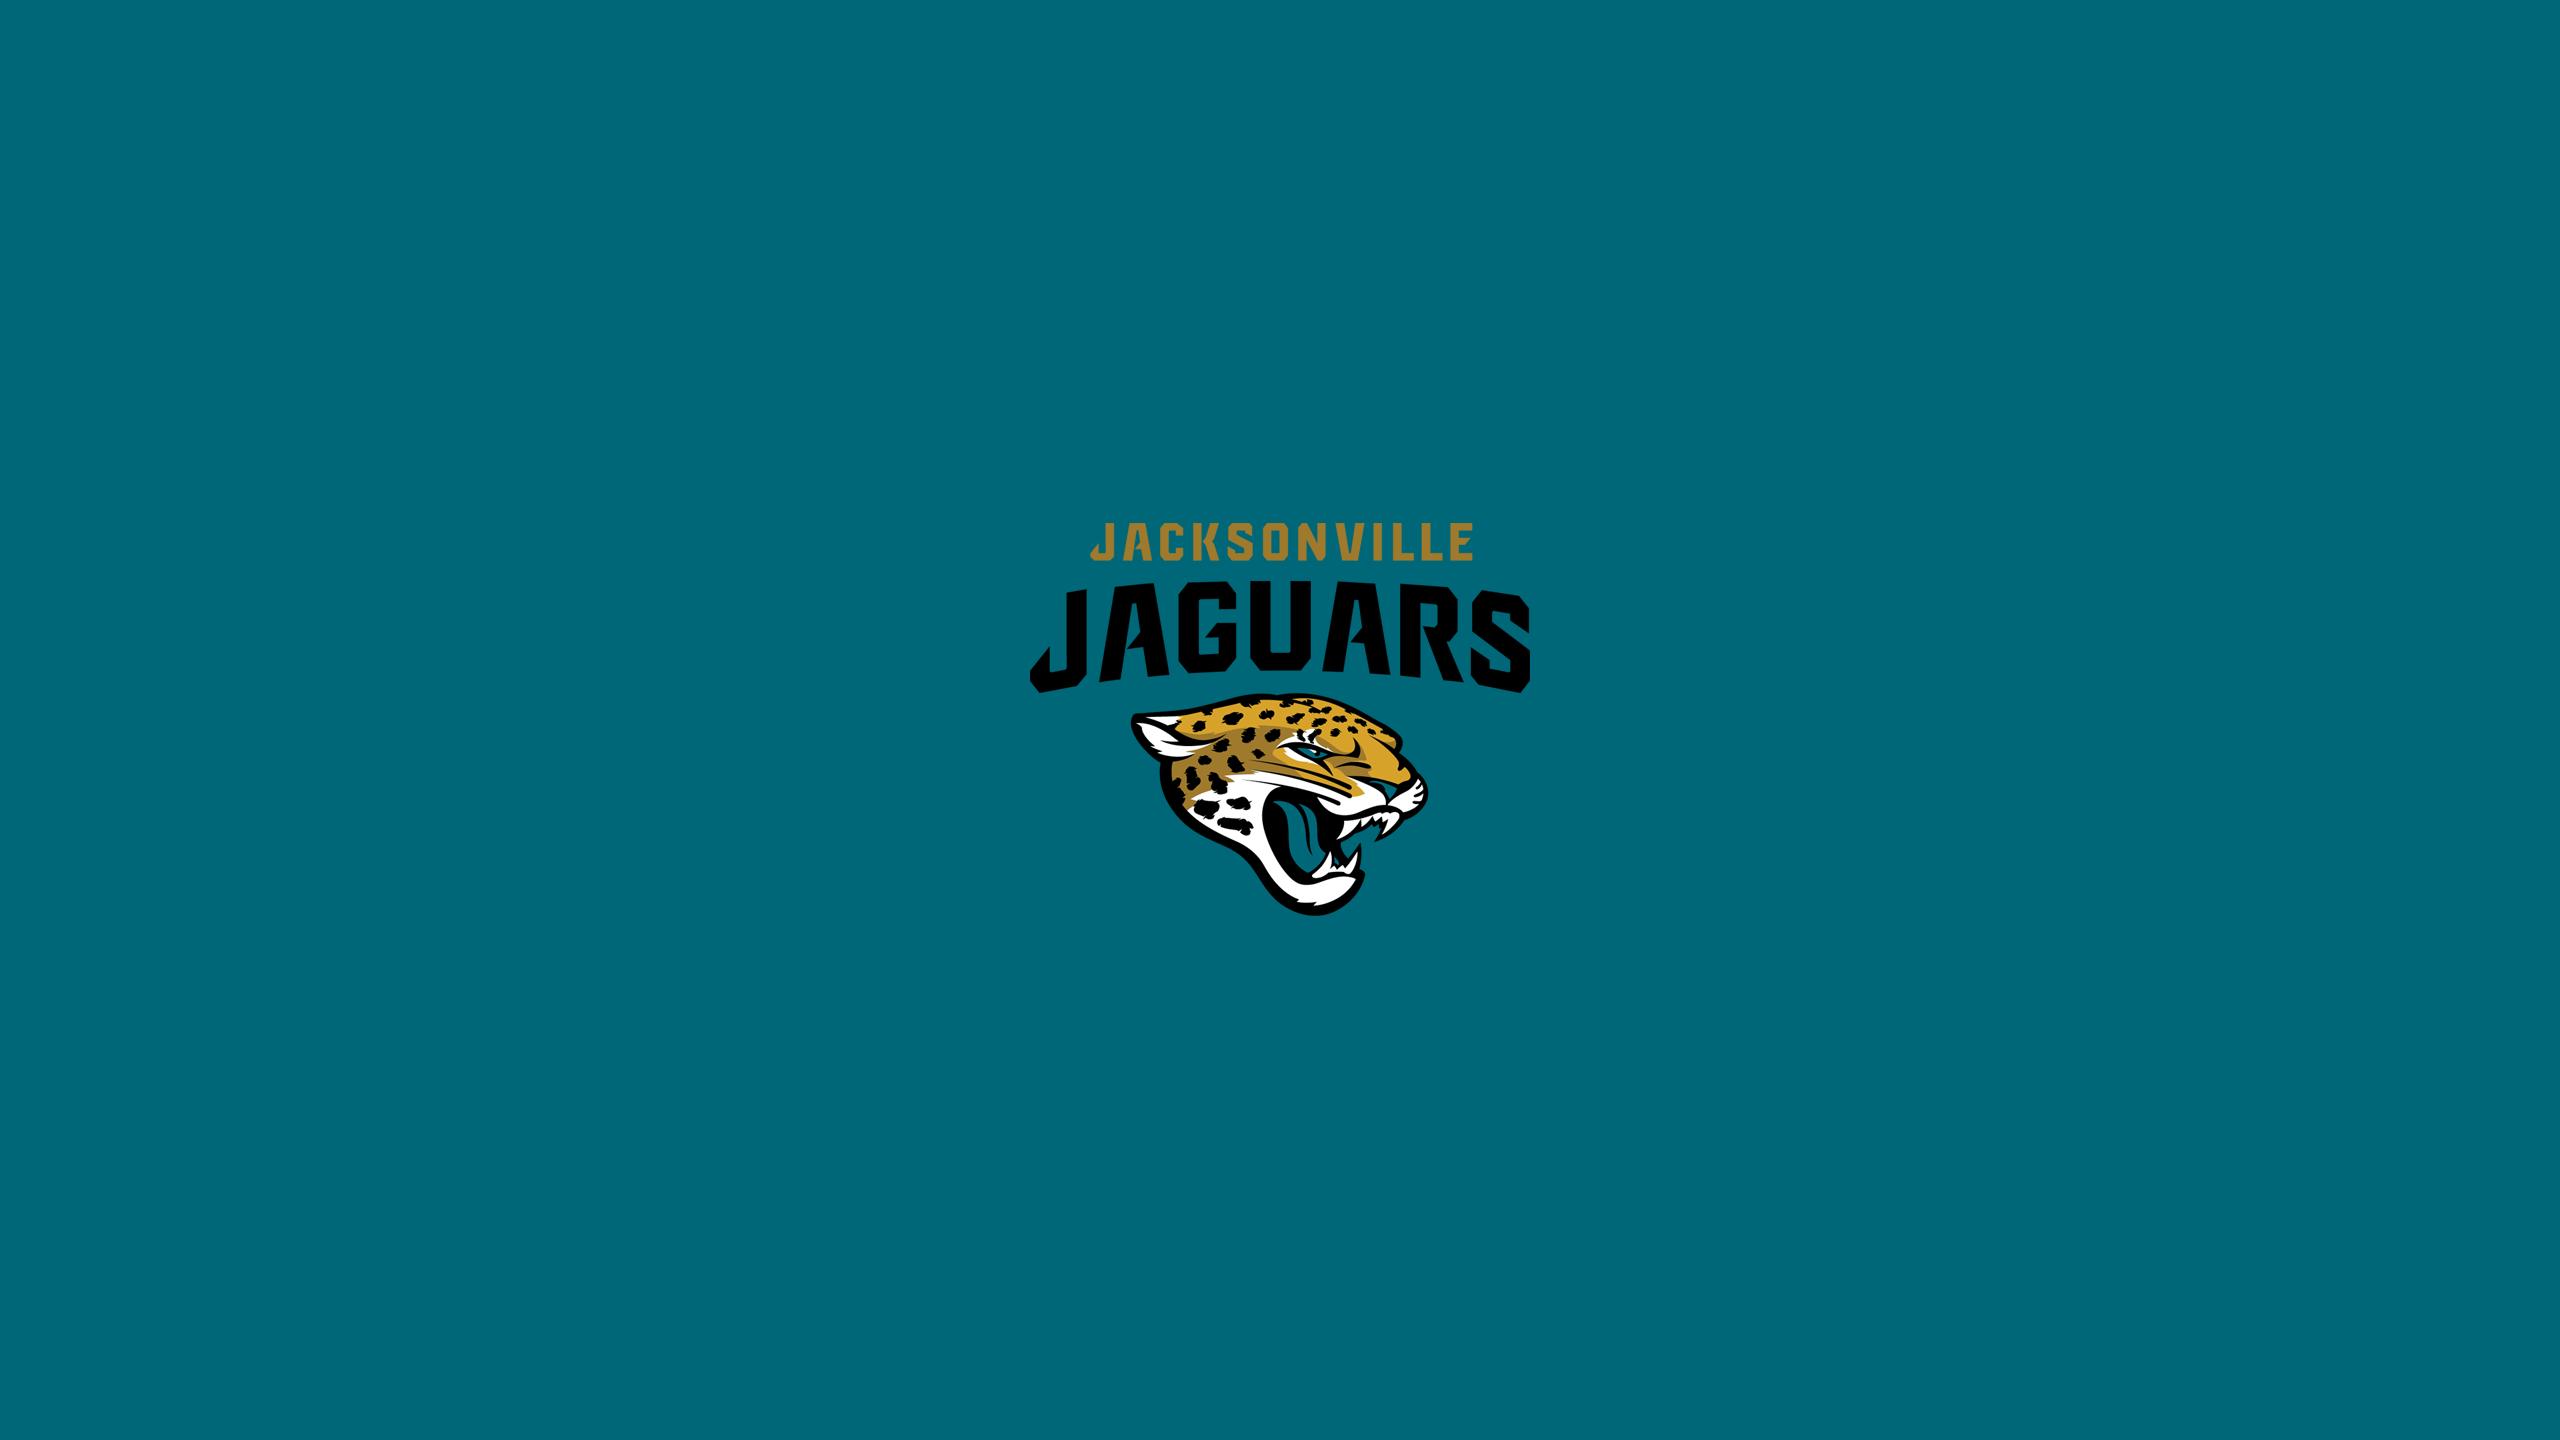 Download Jacksonville Jaguars Wallpaper 14507 25601440 Px